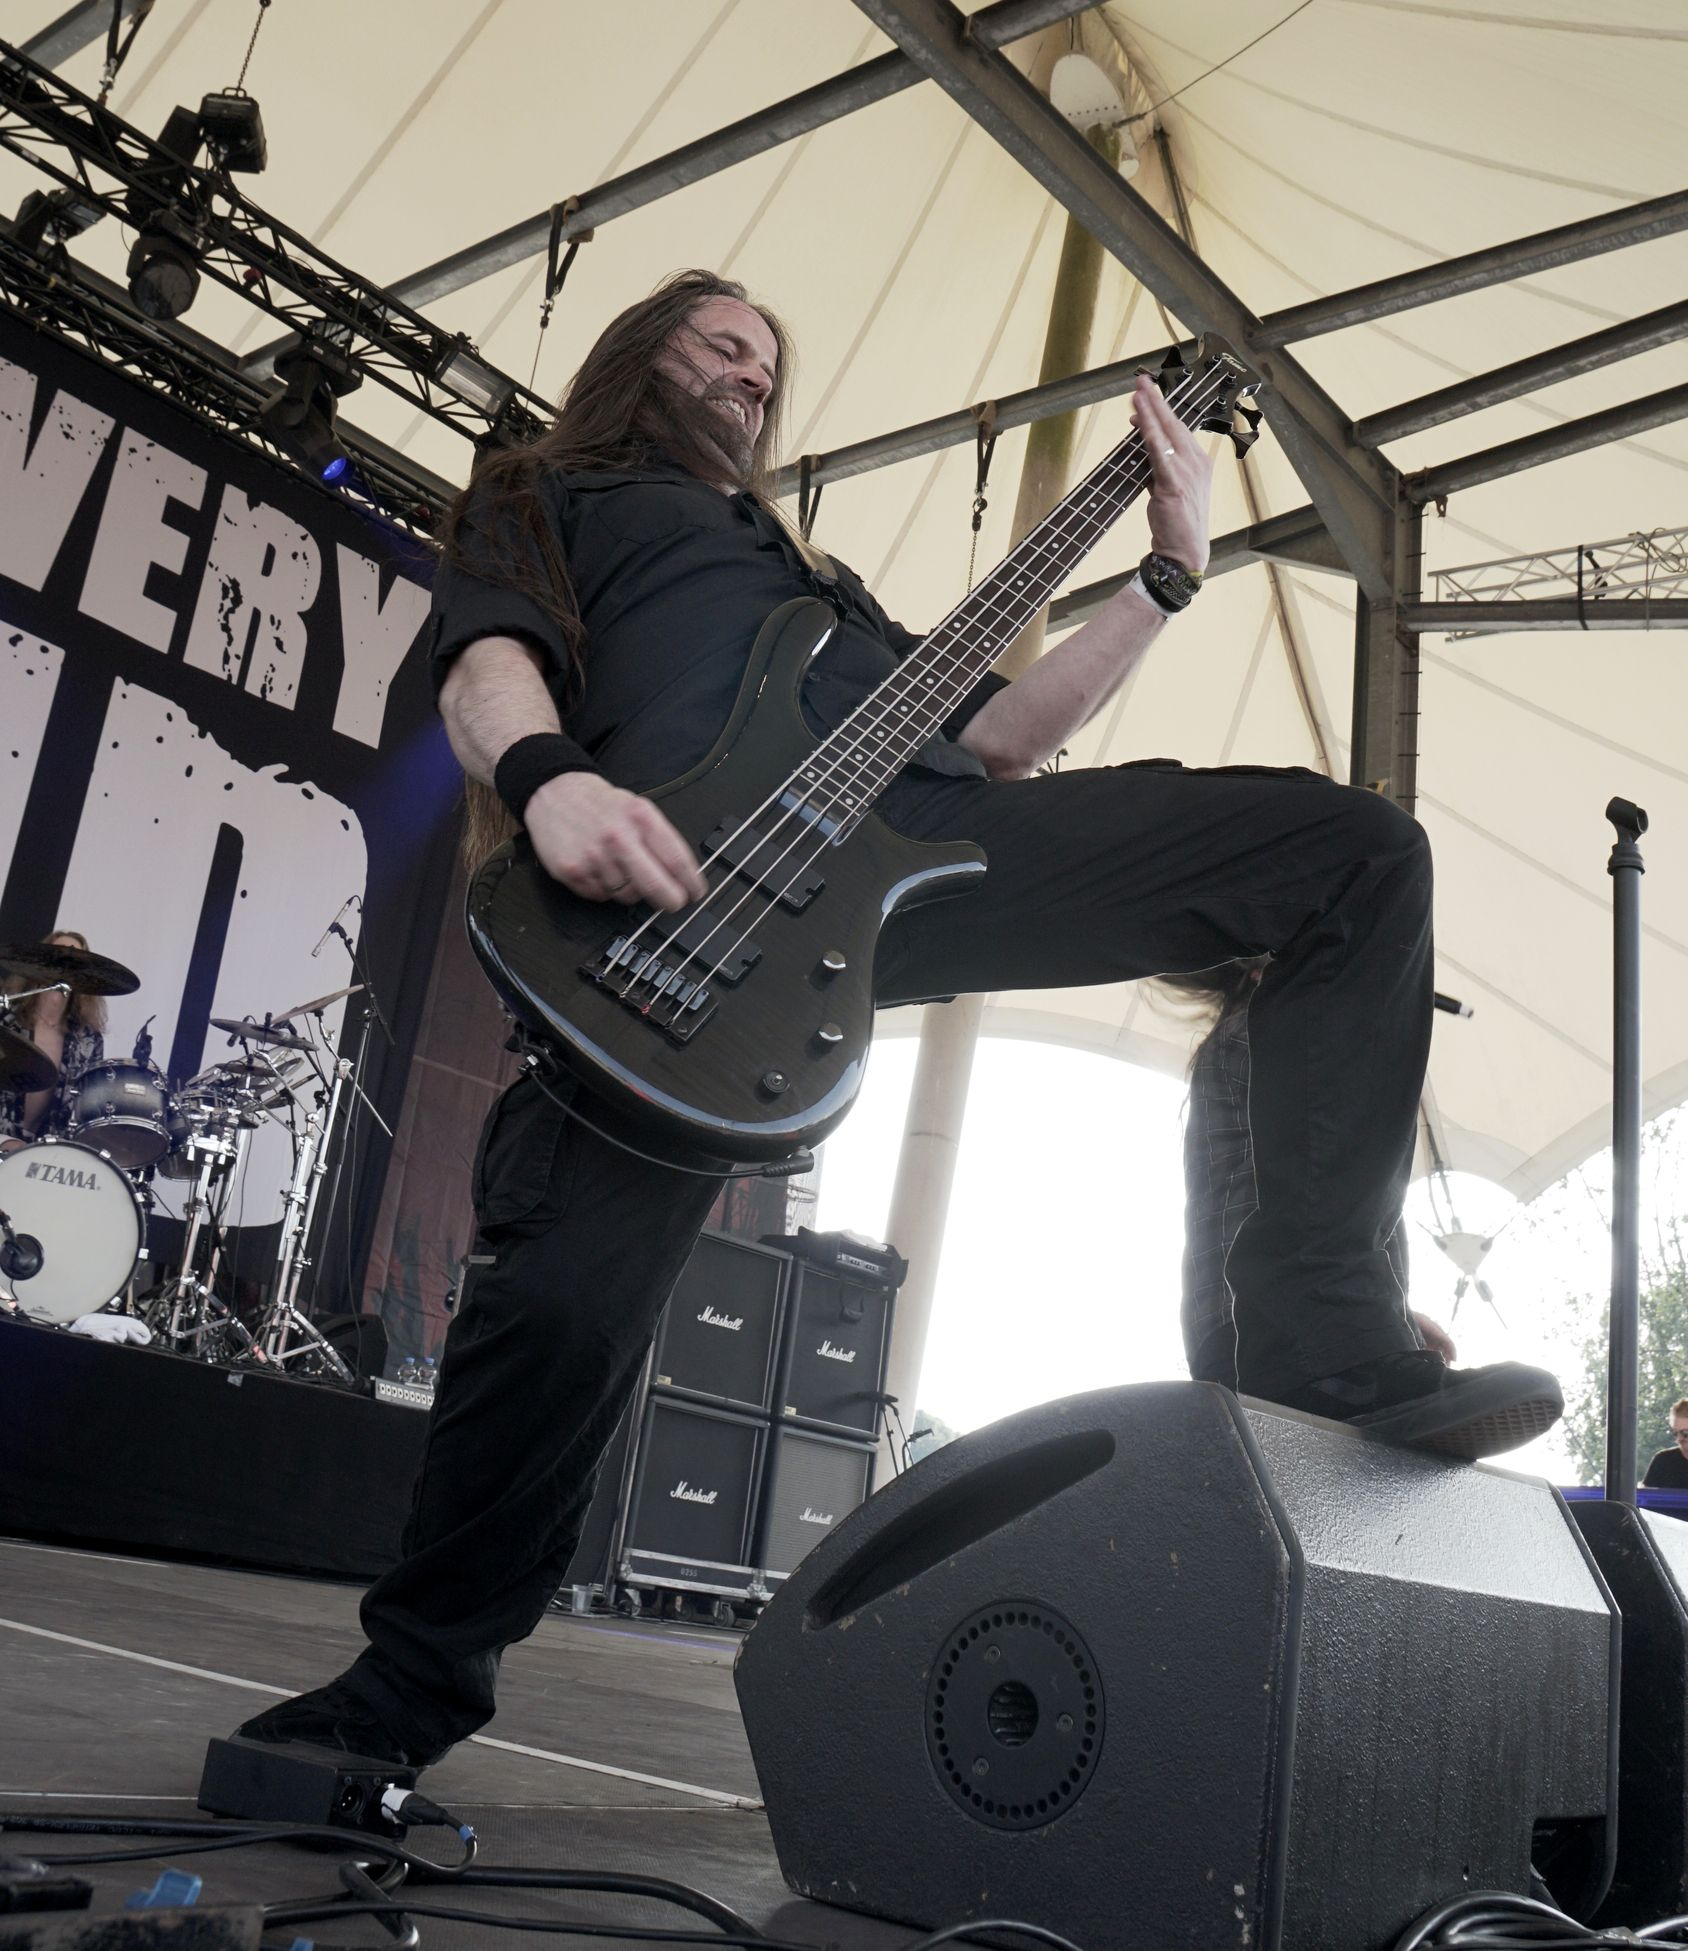 Rock-Hard-Festival-2021-One-Day-The-Very-End-Asphyx-Rage-Motorjesus-Wolfskull-Darkness-Scorched-Oak-Amphitheater-Gelsenkirchen_5